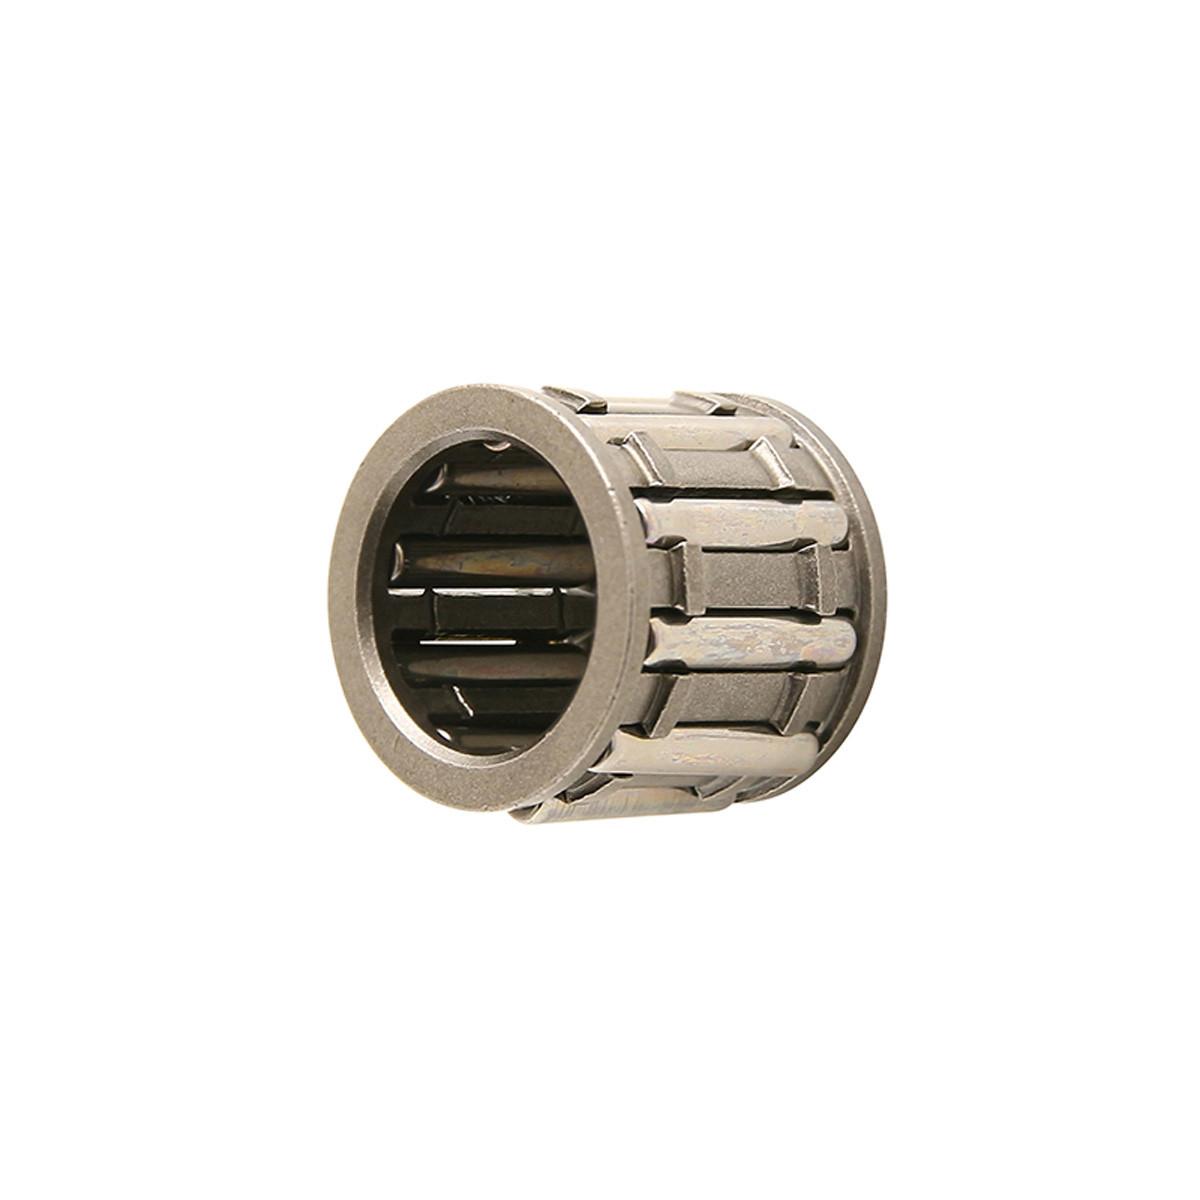 Cage à Aiguilles 10 x 14 x 12.5mm - Top Perf TPR